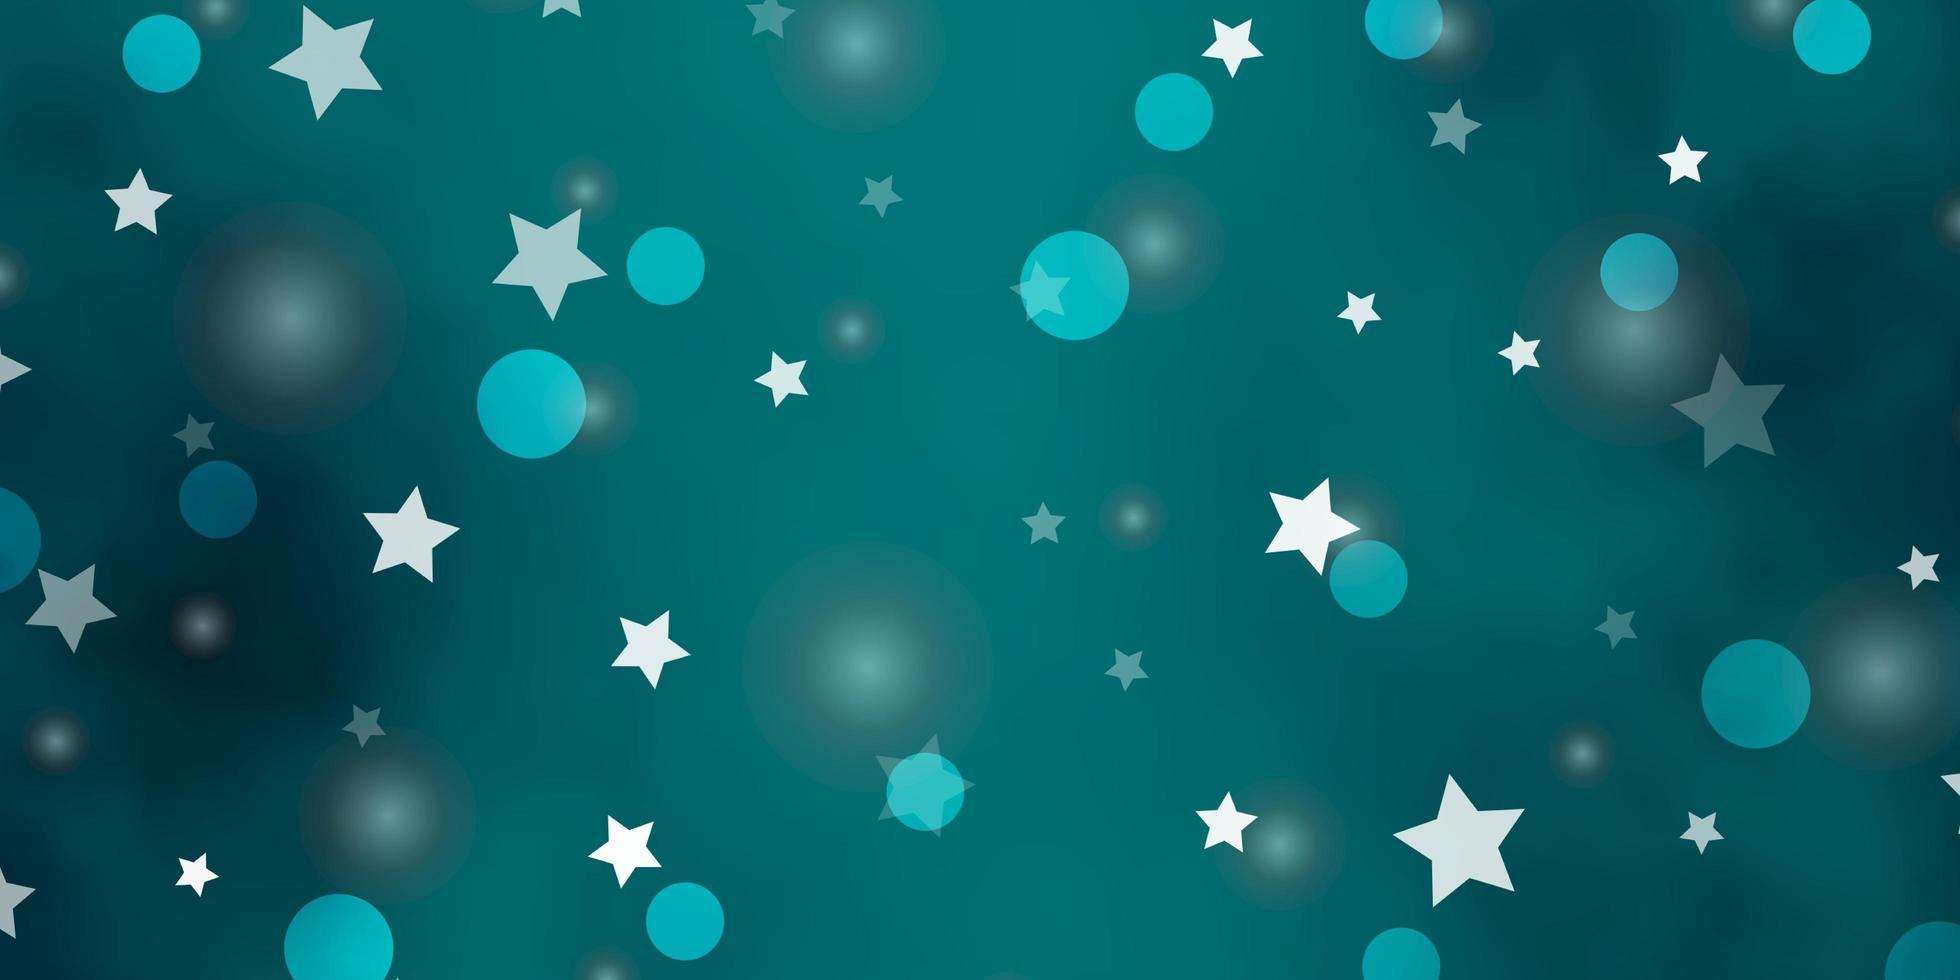 modelo de vetor verde claro com círculos, estrelas.